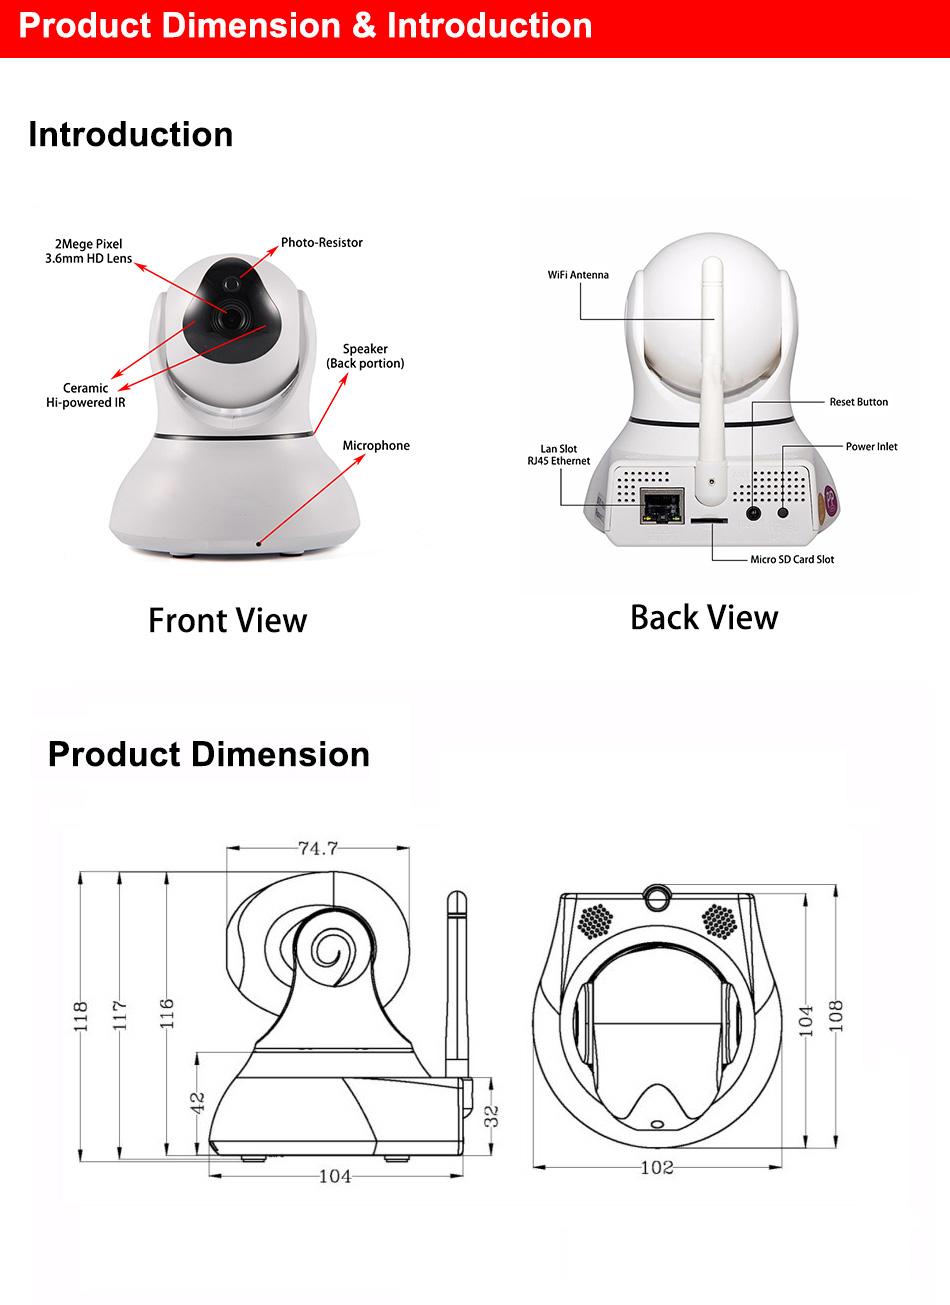 D1201-HE Intelligent pan tilt network camera dimension